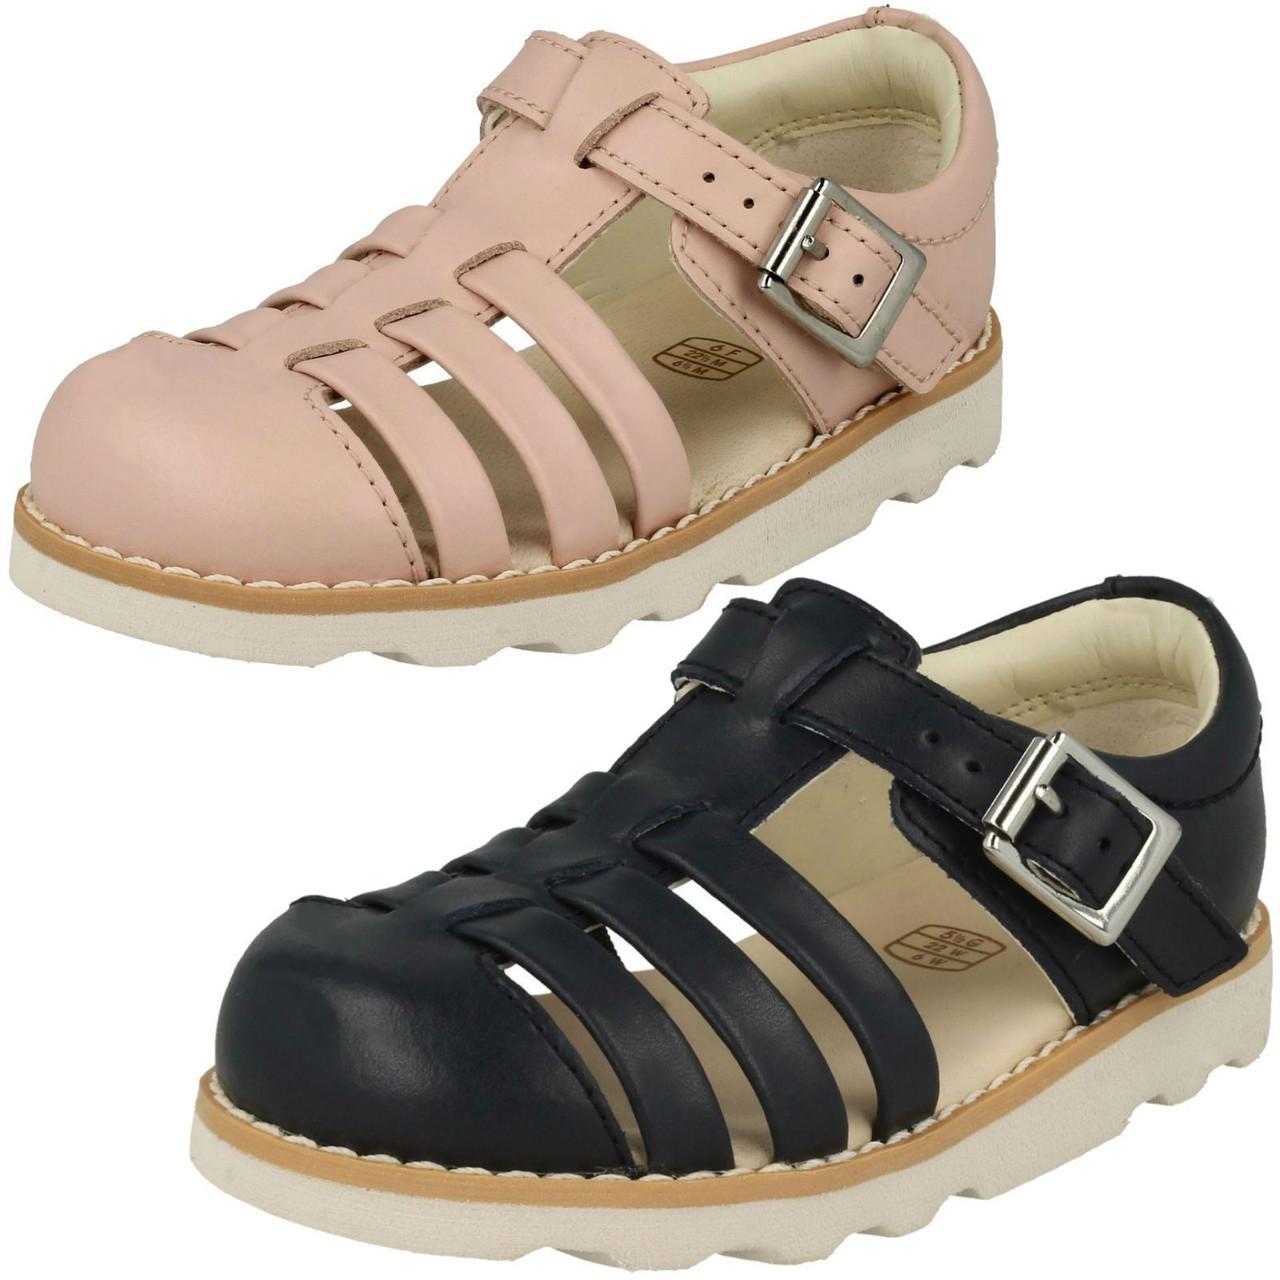 microscópico Ahorro Esperar algo  Childrens Boys Girls Clarks Closed Toe Sandals Crown Stem